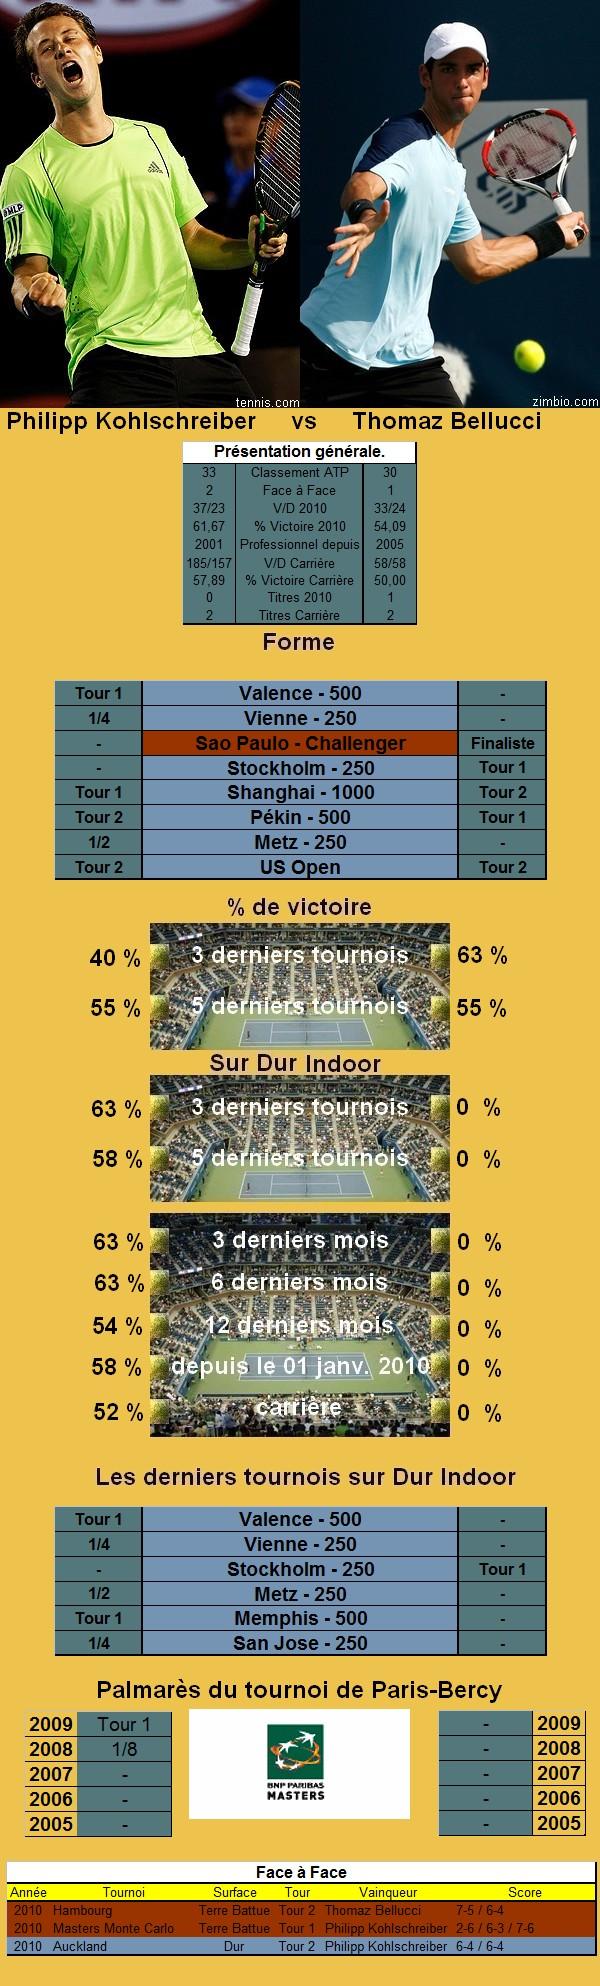 Statistiques tennis de Kohlschreiber contre Bellucci à Paris Bercy